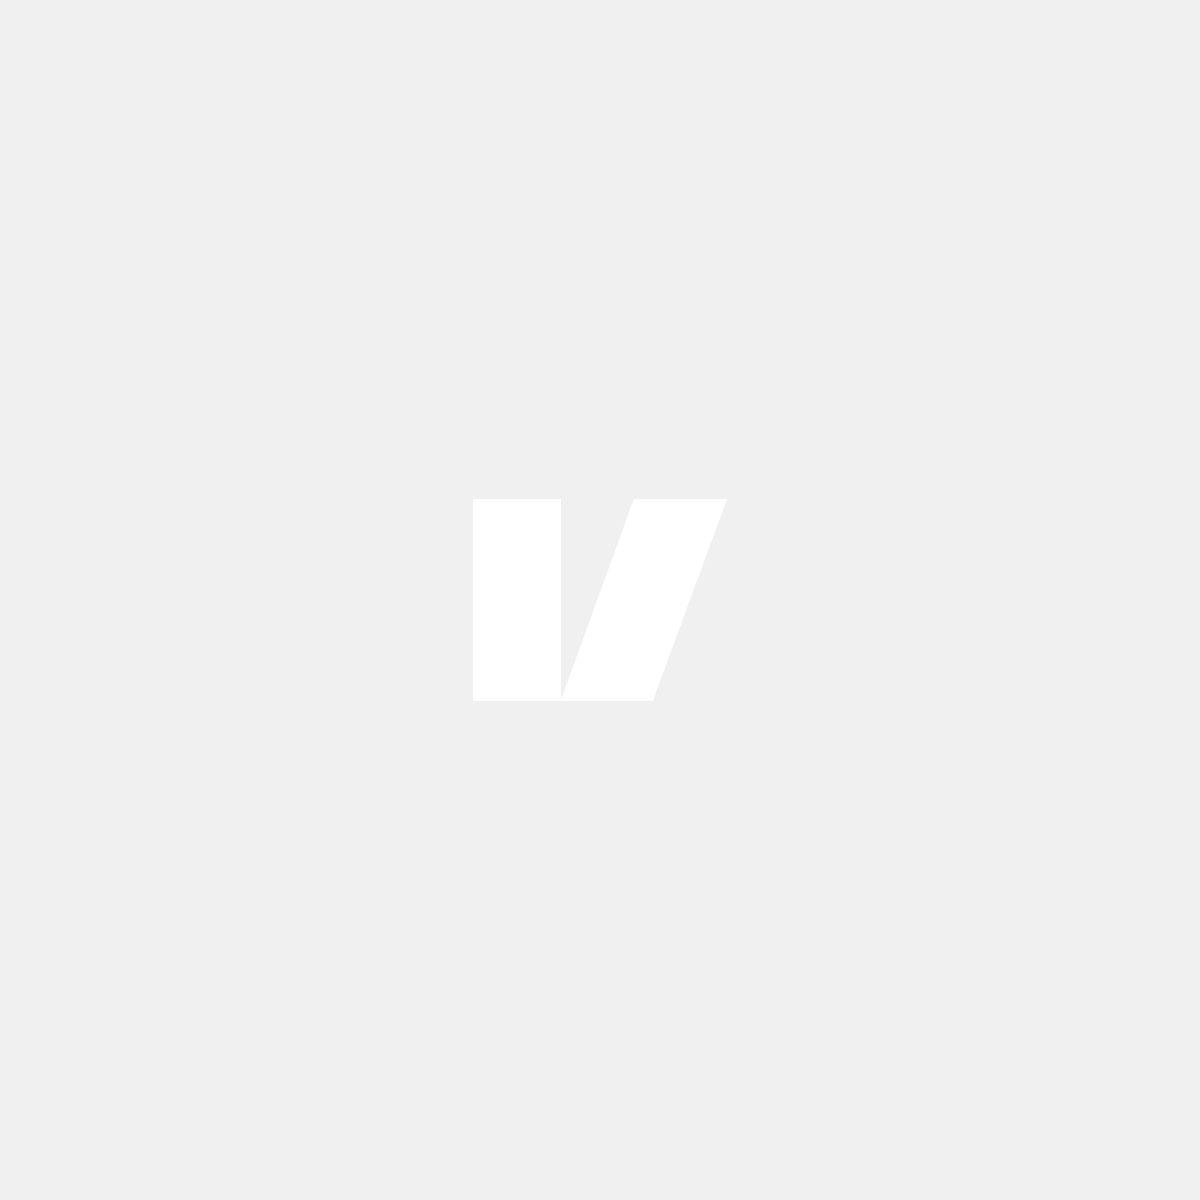 Iridium spoiler for Volvo V70, XC70 00-07